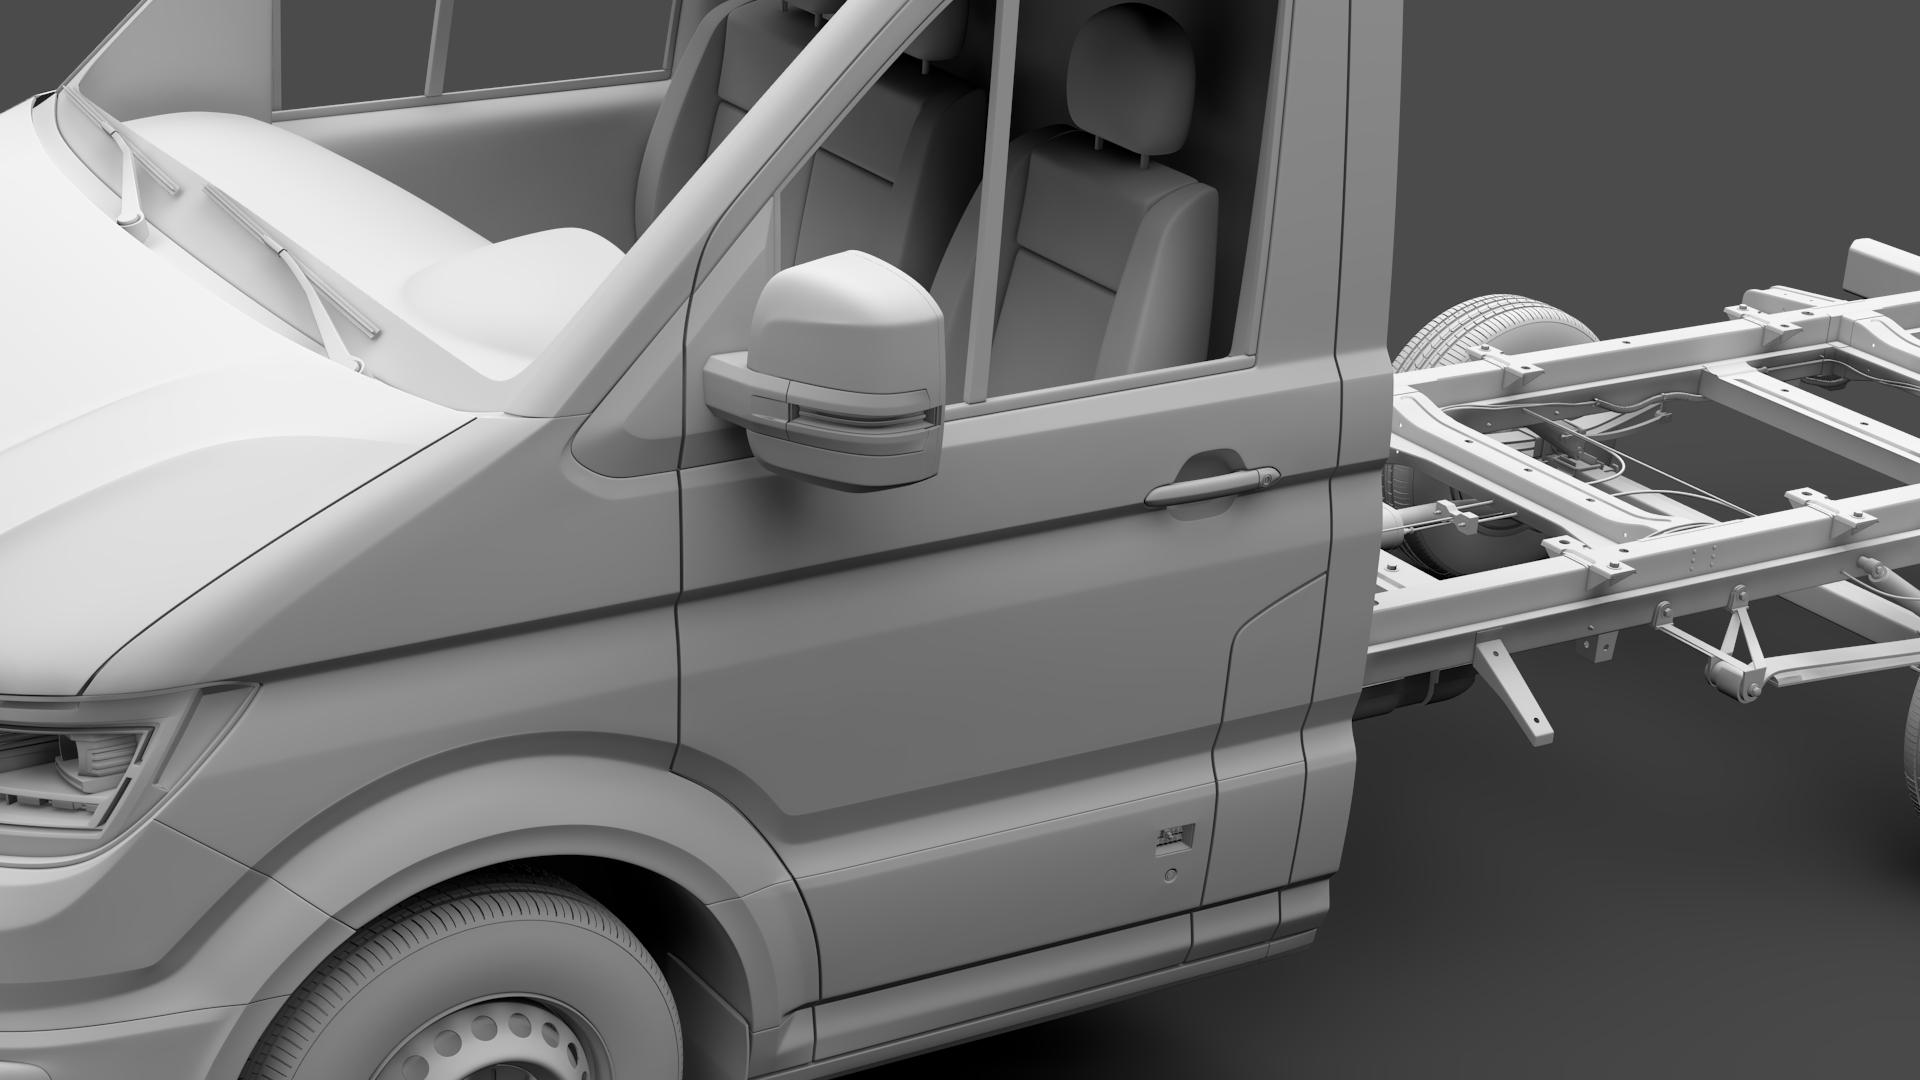 wv crafter chassis single-cab 2017 3d model max fbx c4d lwo ma mb hrc xsi obj 275104